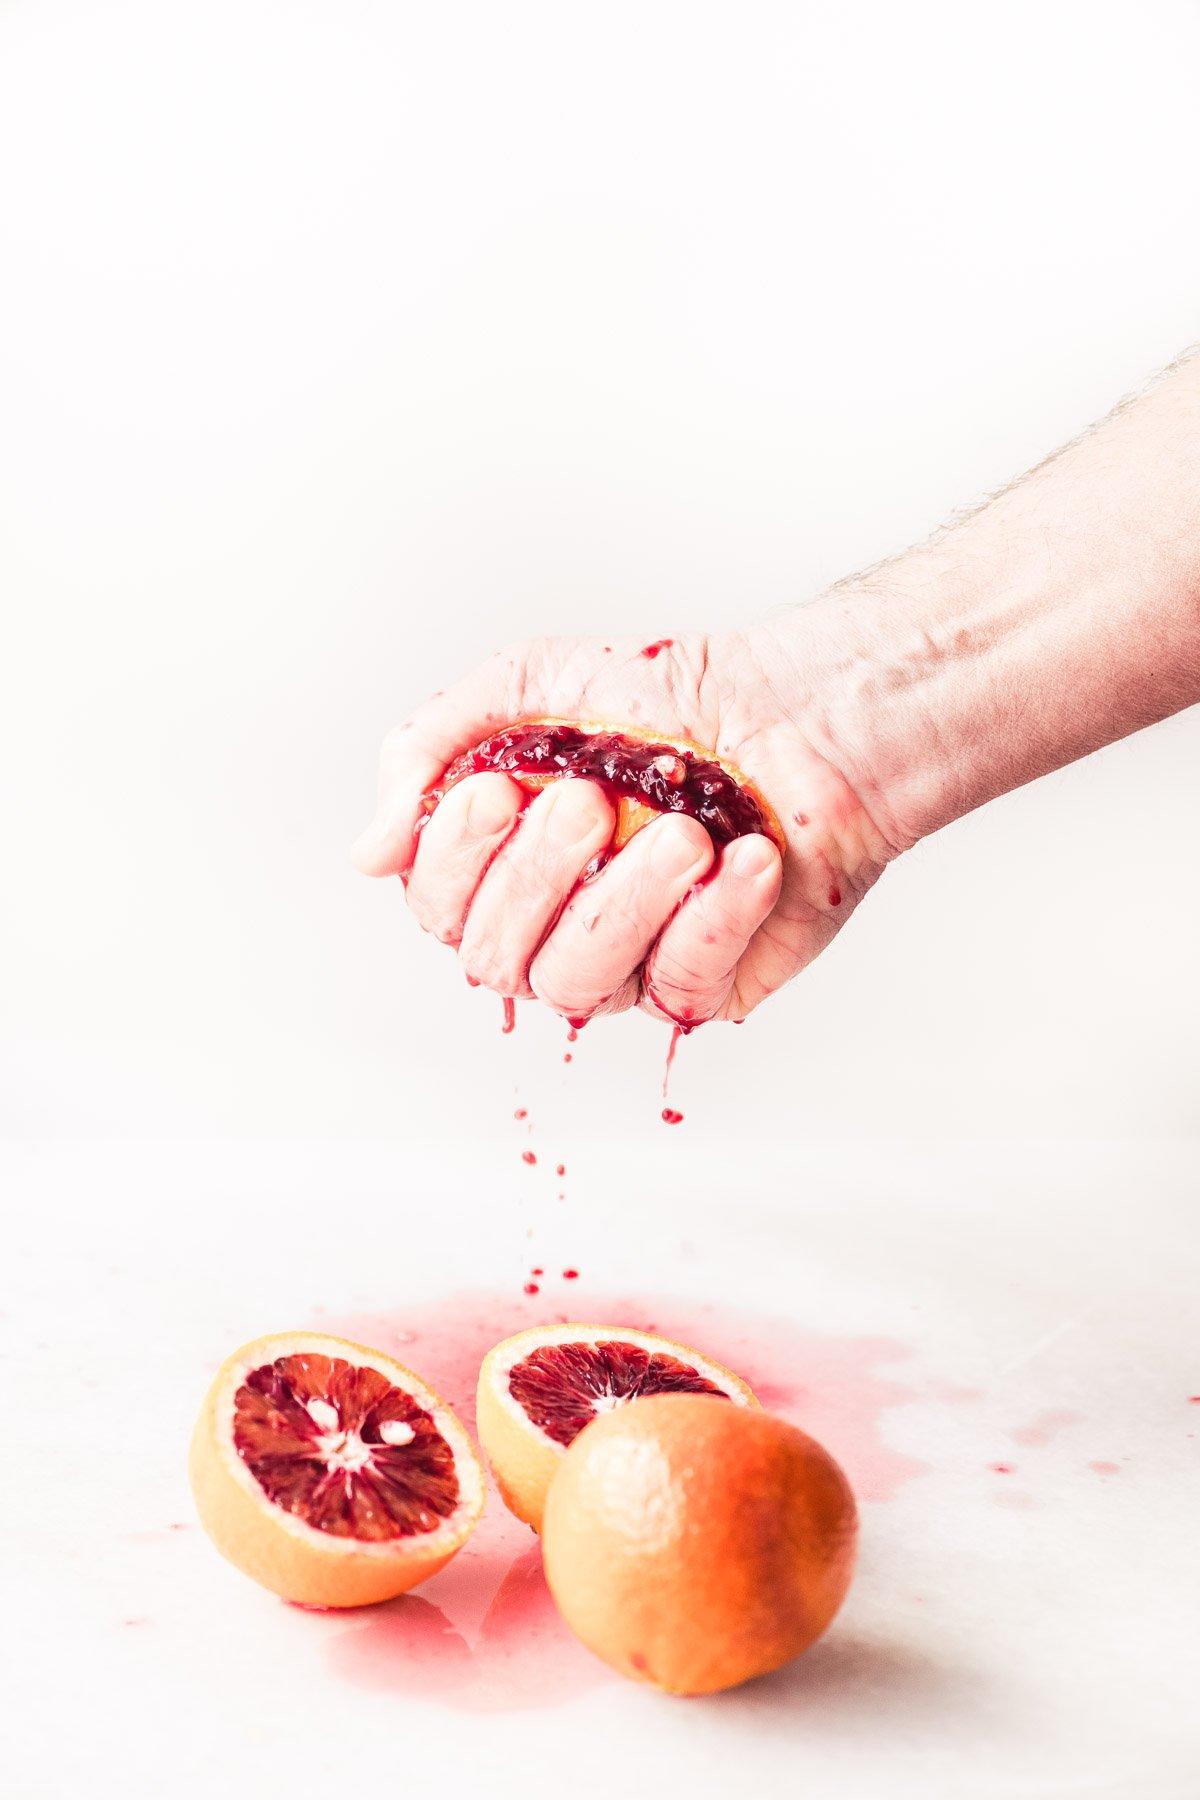 squeezing a blood orange for a blood orange spremuta